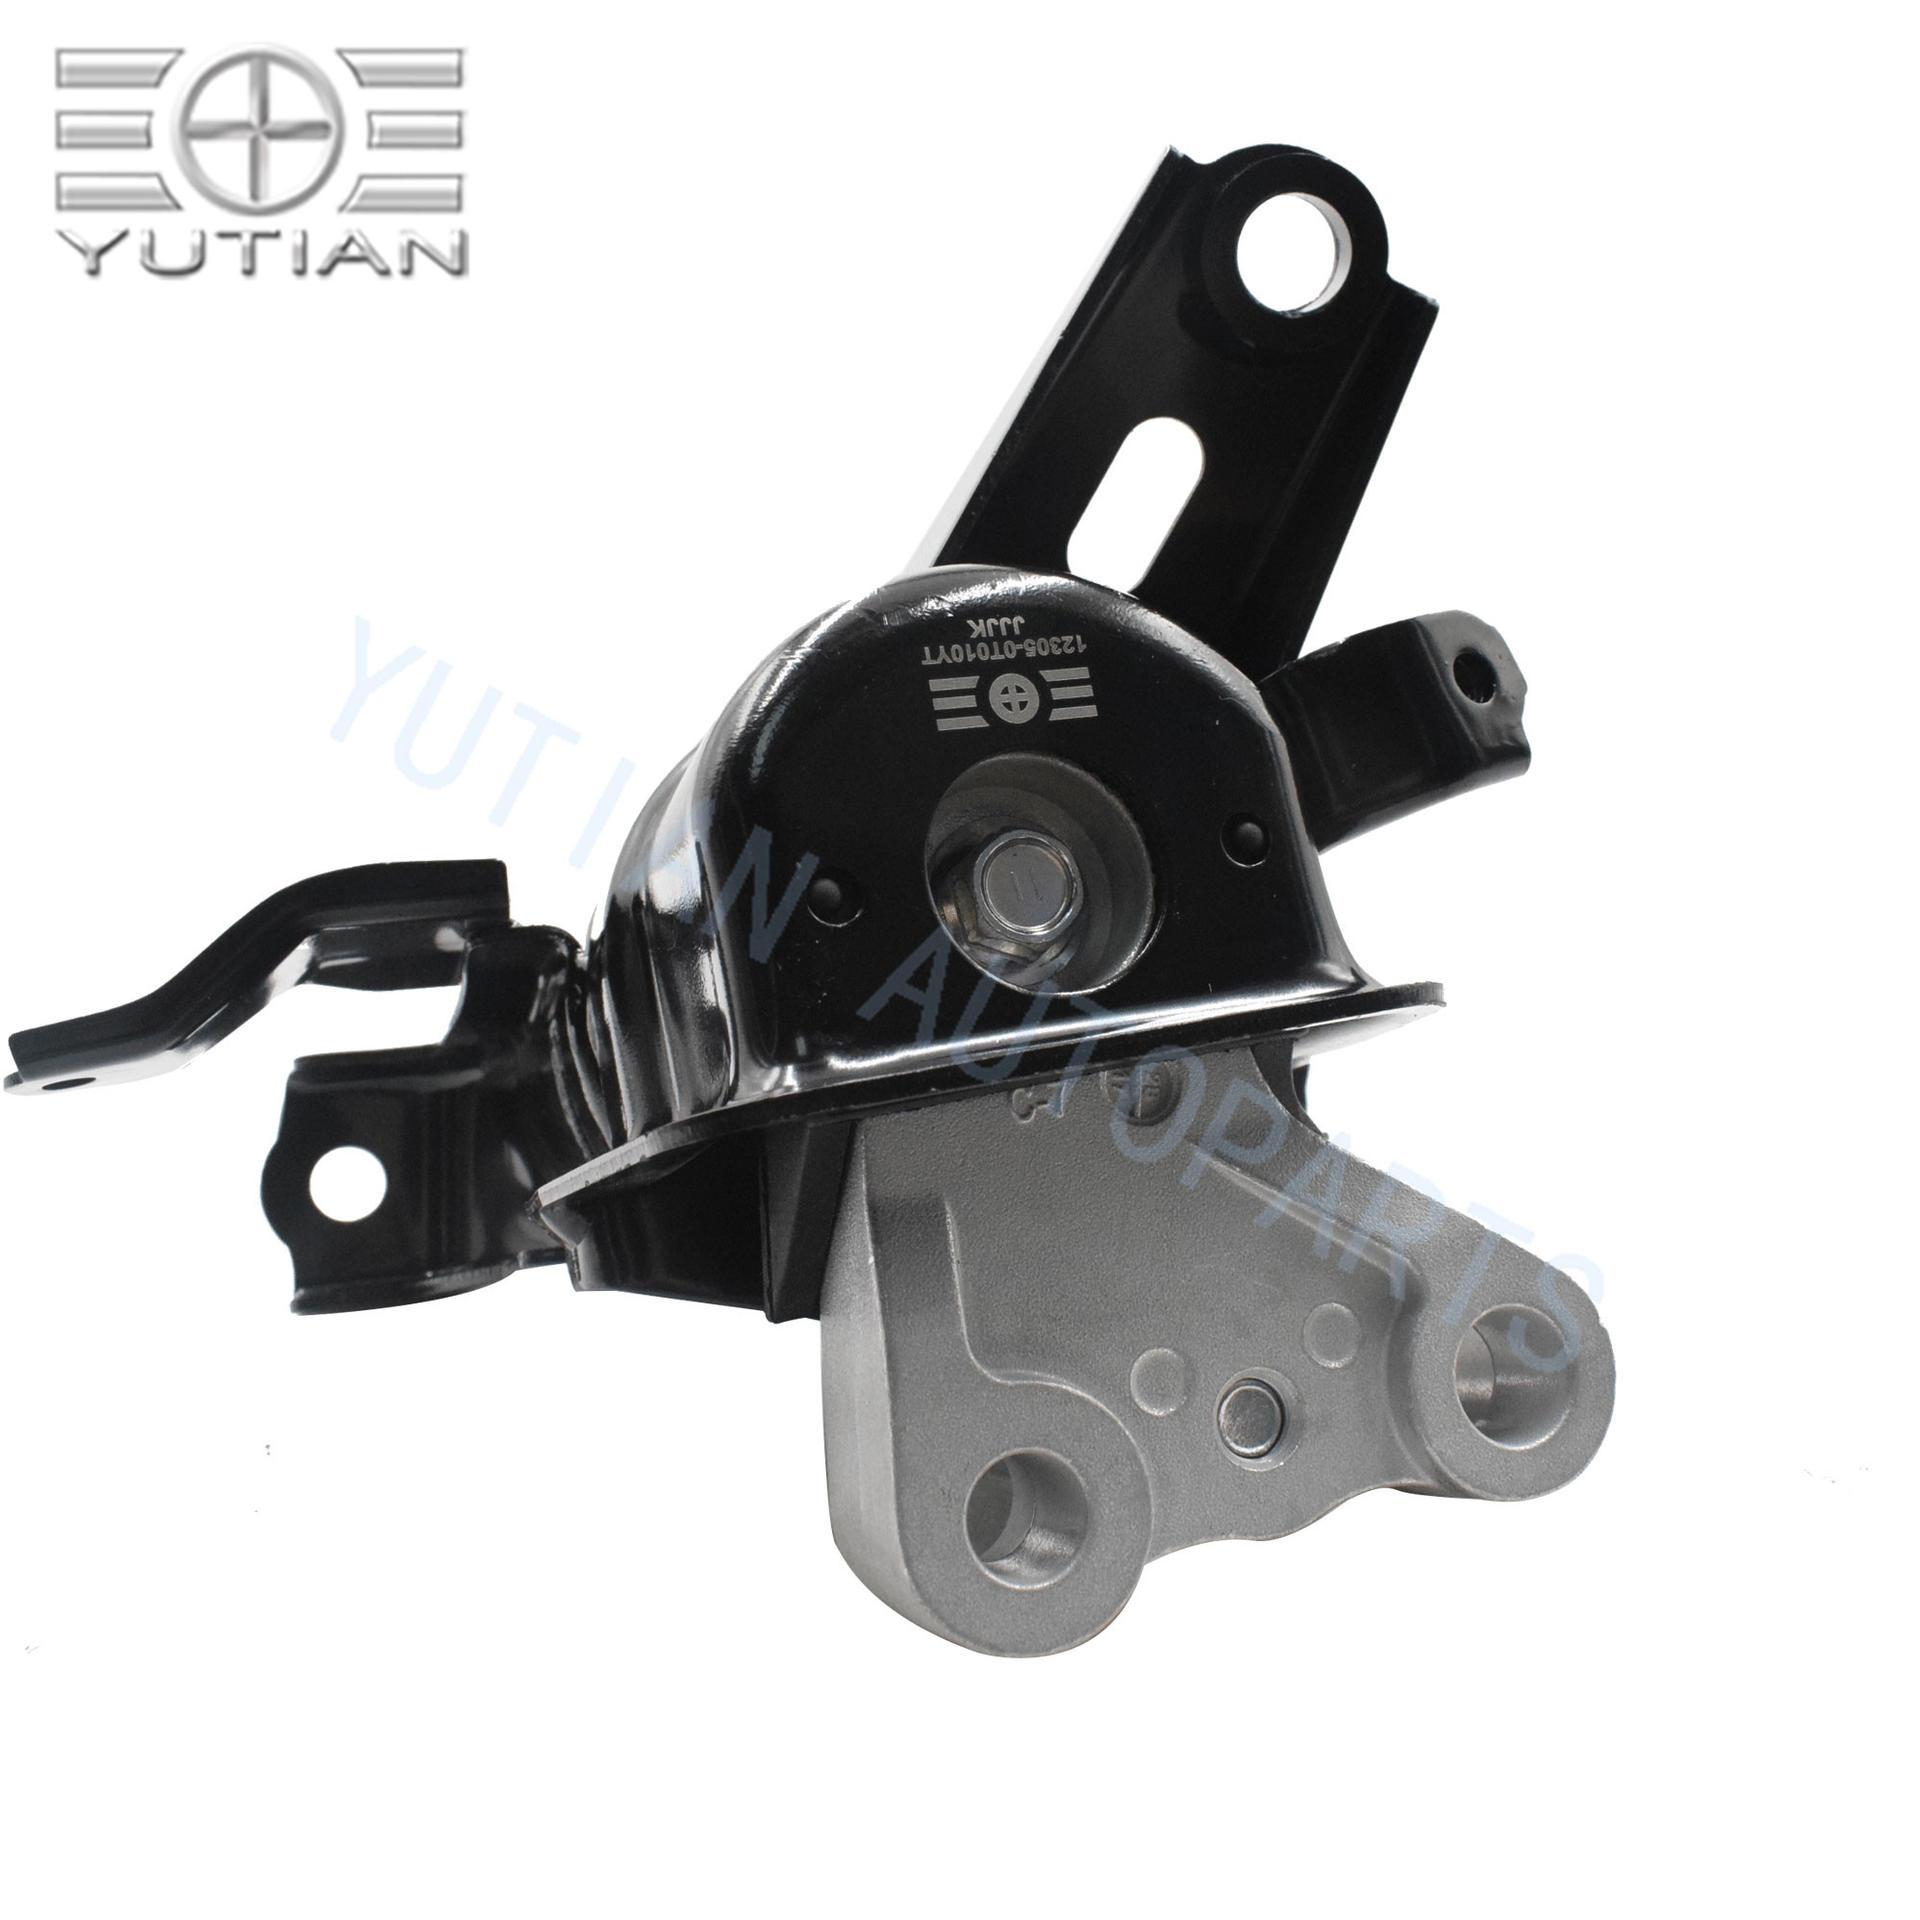 For Toyota Corolla ZRE152 2007-2010 1.6/1.8 Right Engine Mount Bracket OEM 12305-0T010